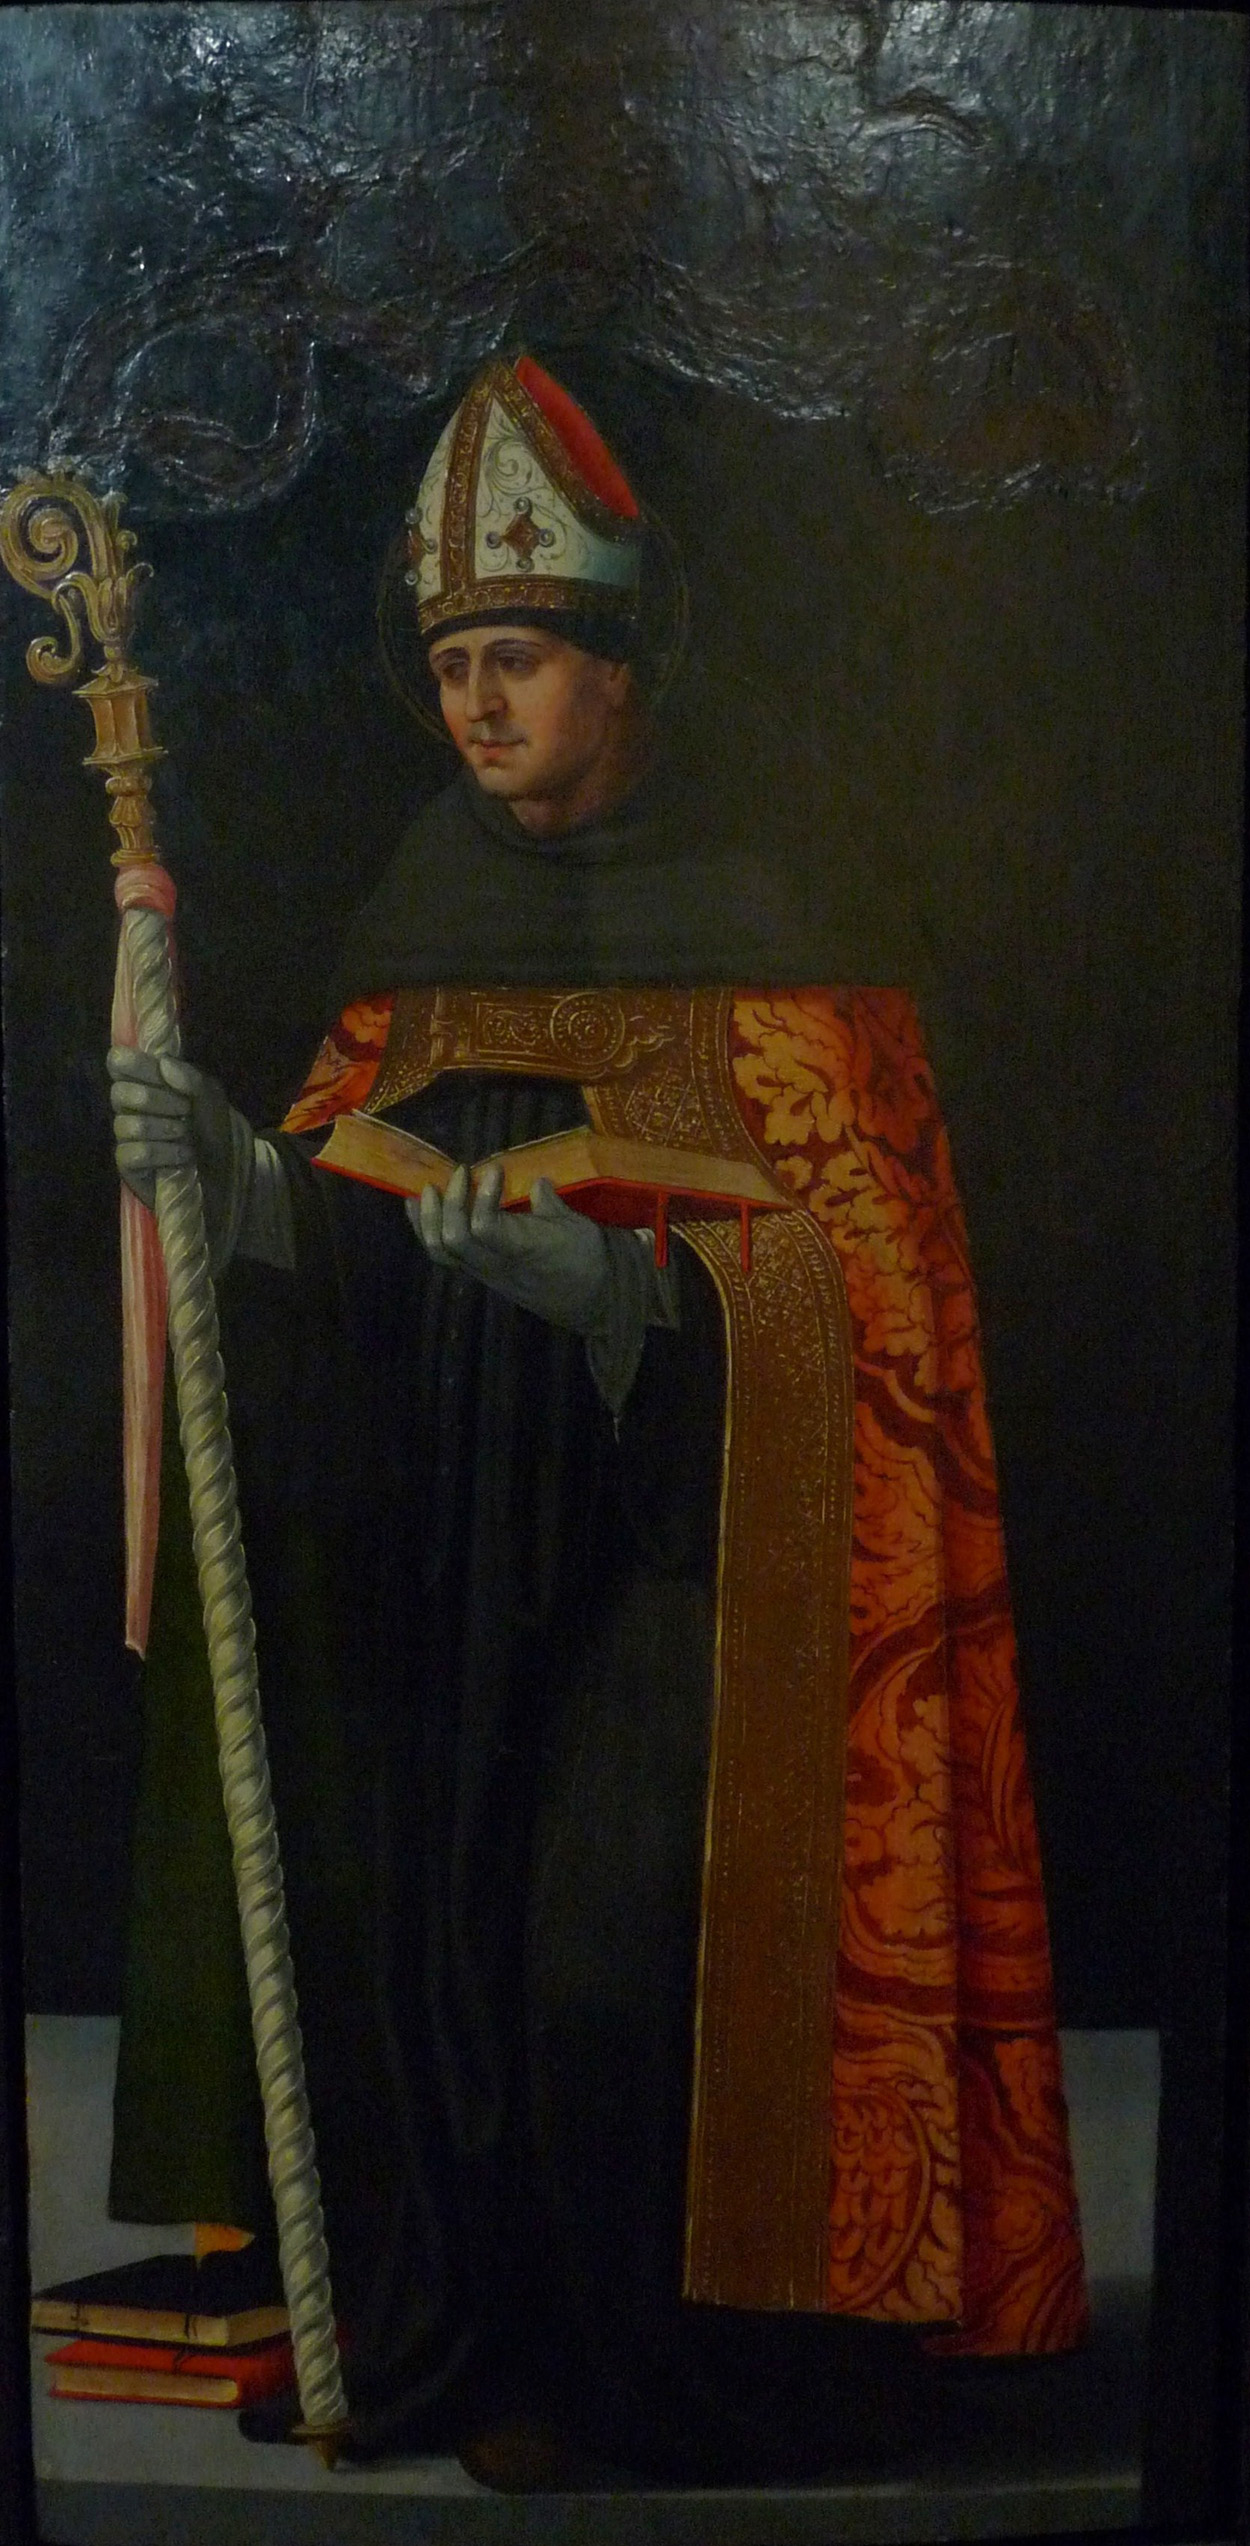 4 E 31.- Tabla de Vicente Macip (Andilla, 1475 – Valencia, 1545). San Agustín. Óleo. 80 x 38,3 cm. Valencia, 1º 1/3 siglo XVI